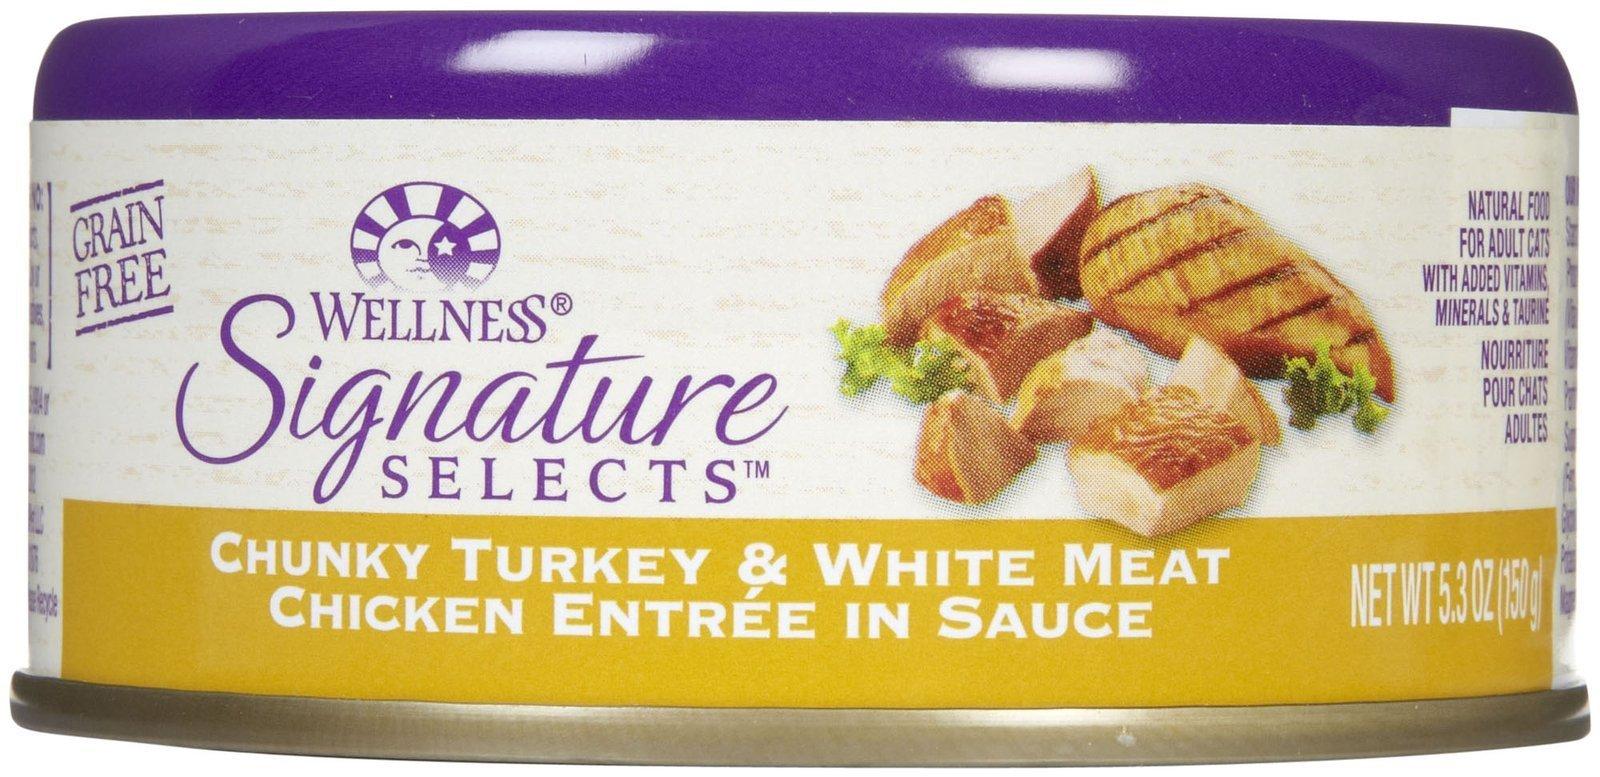 Wellness Signature Selects Chunky Turkey & Chicken - 24x5.3oz